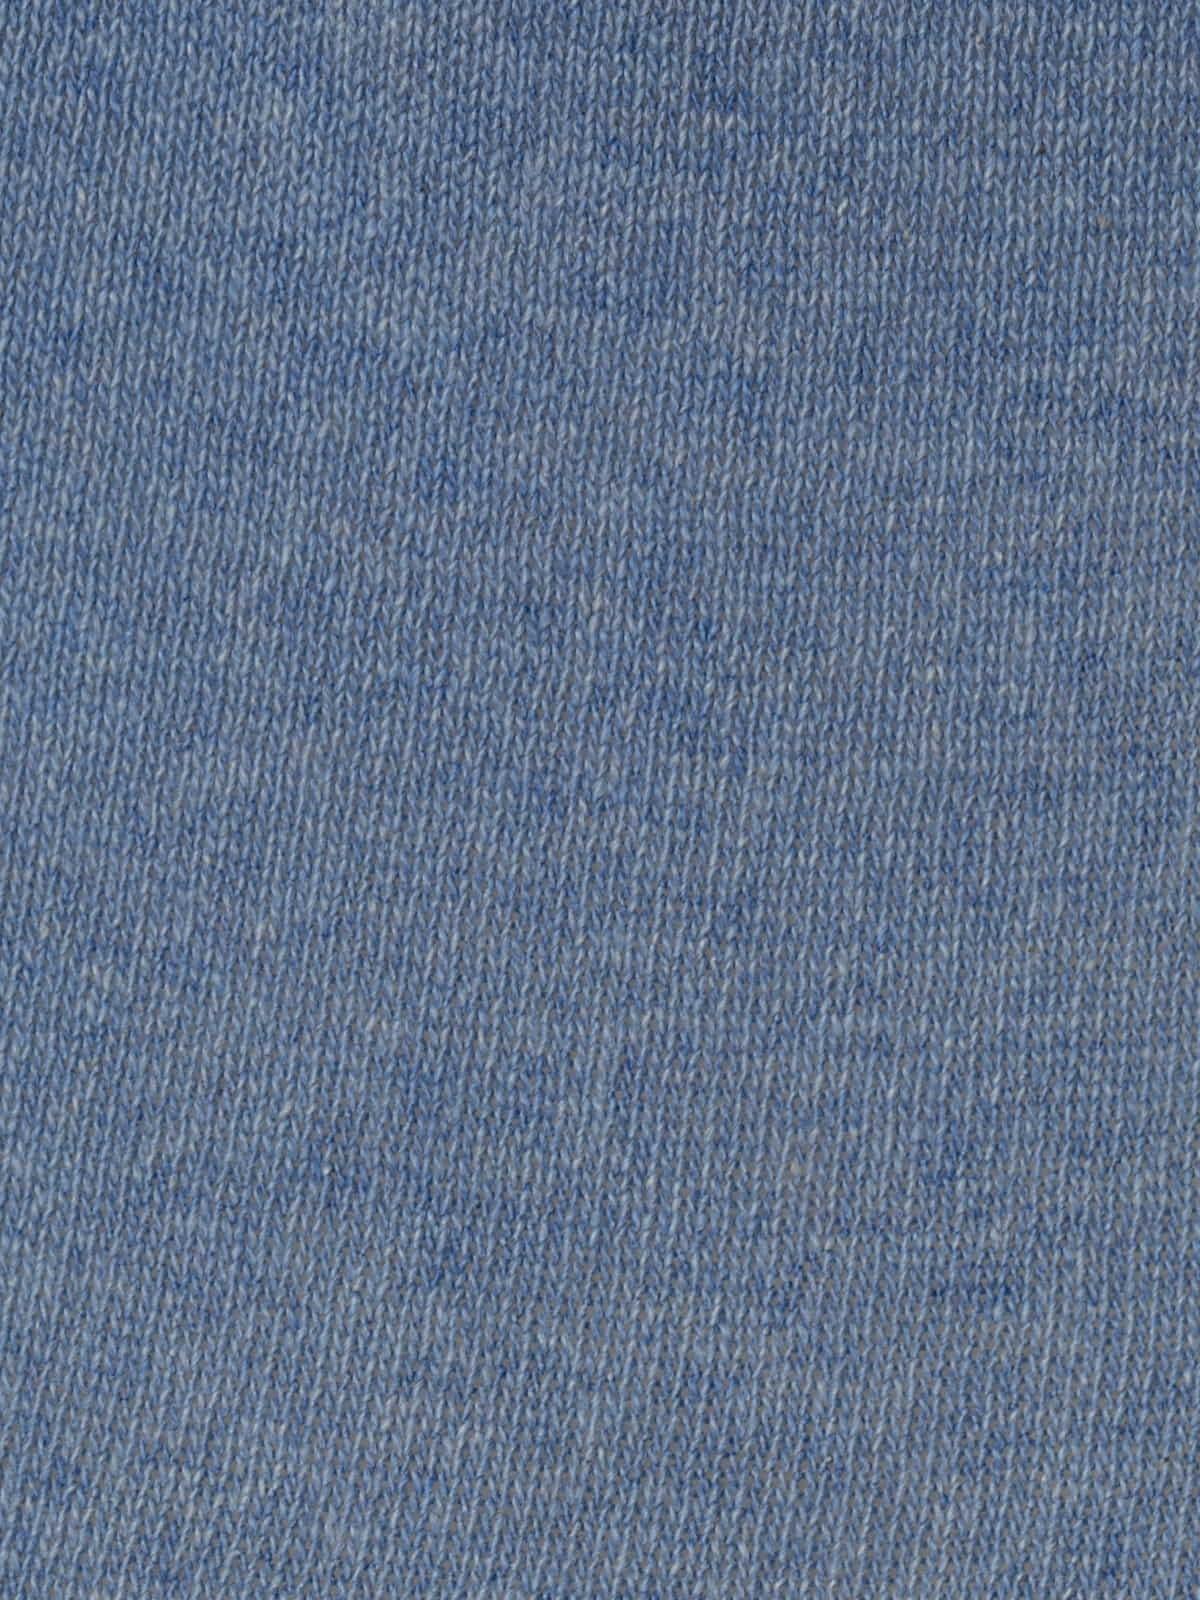 Jersey mujer punto dibujo estrella Azul Jean